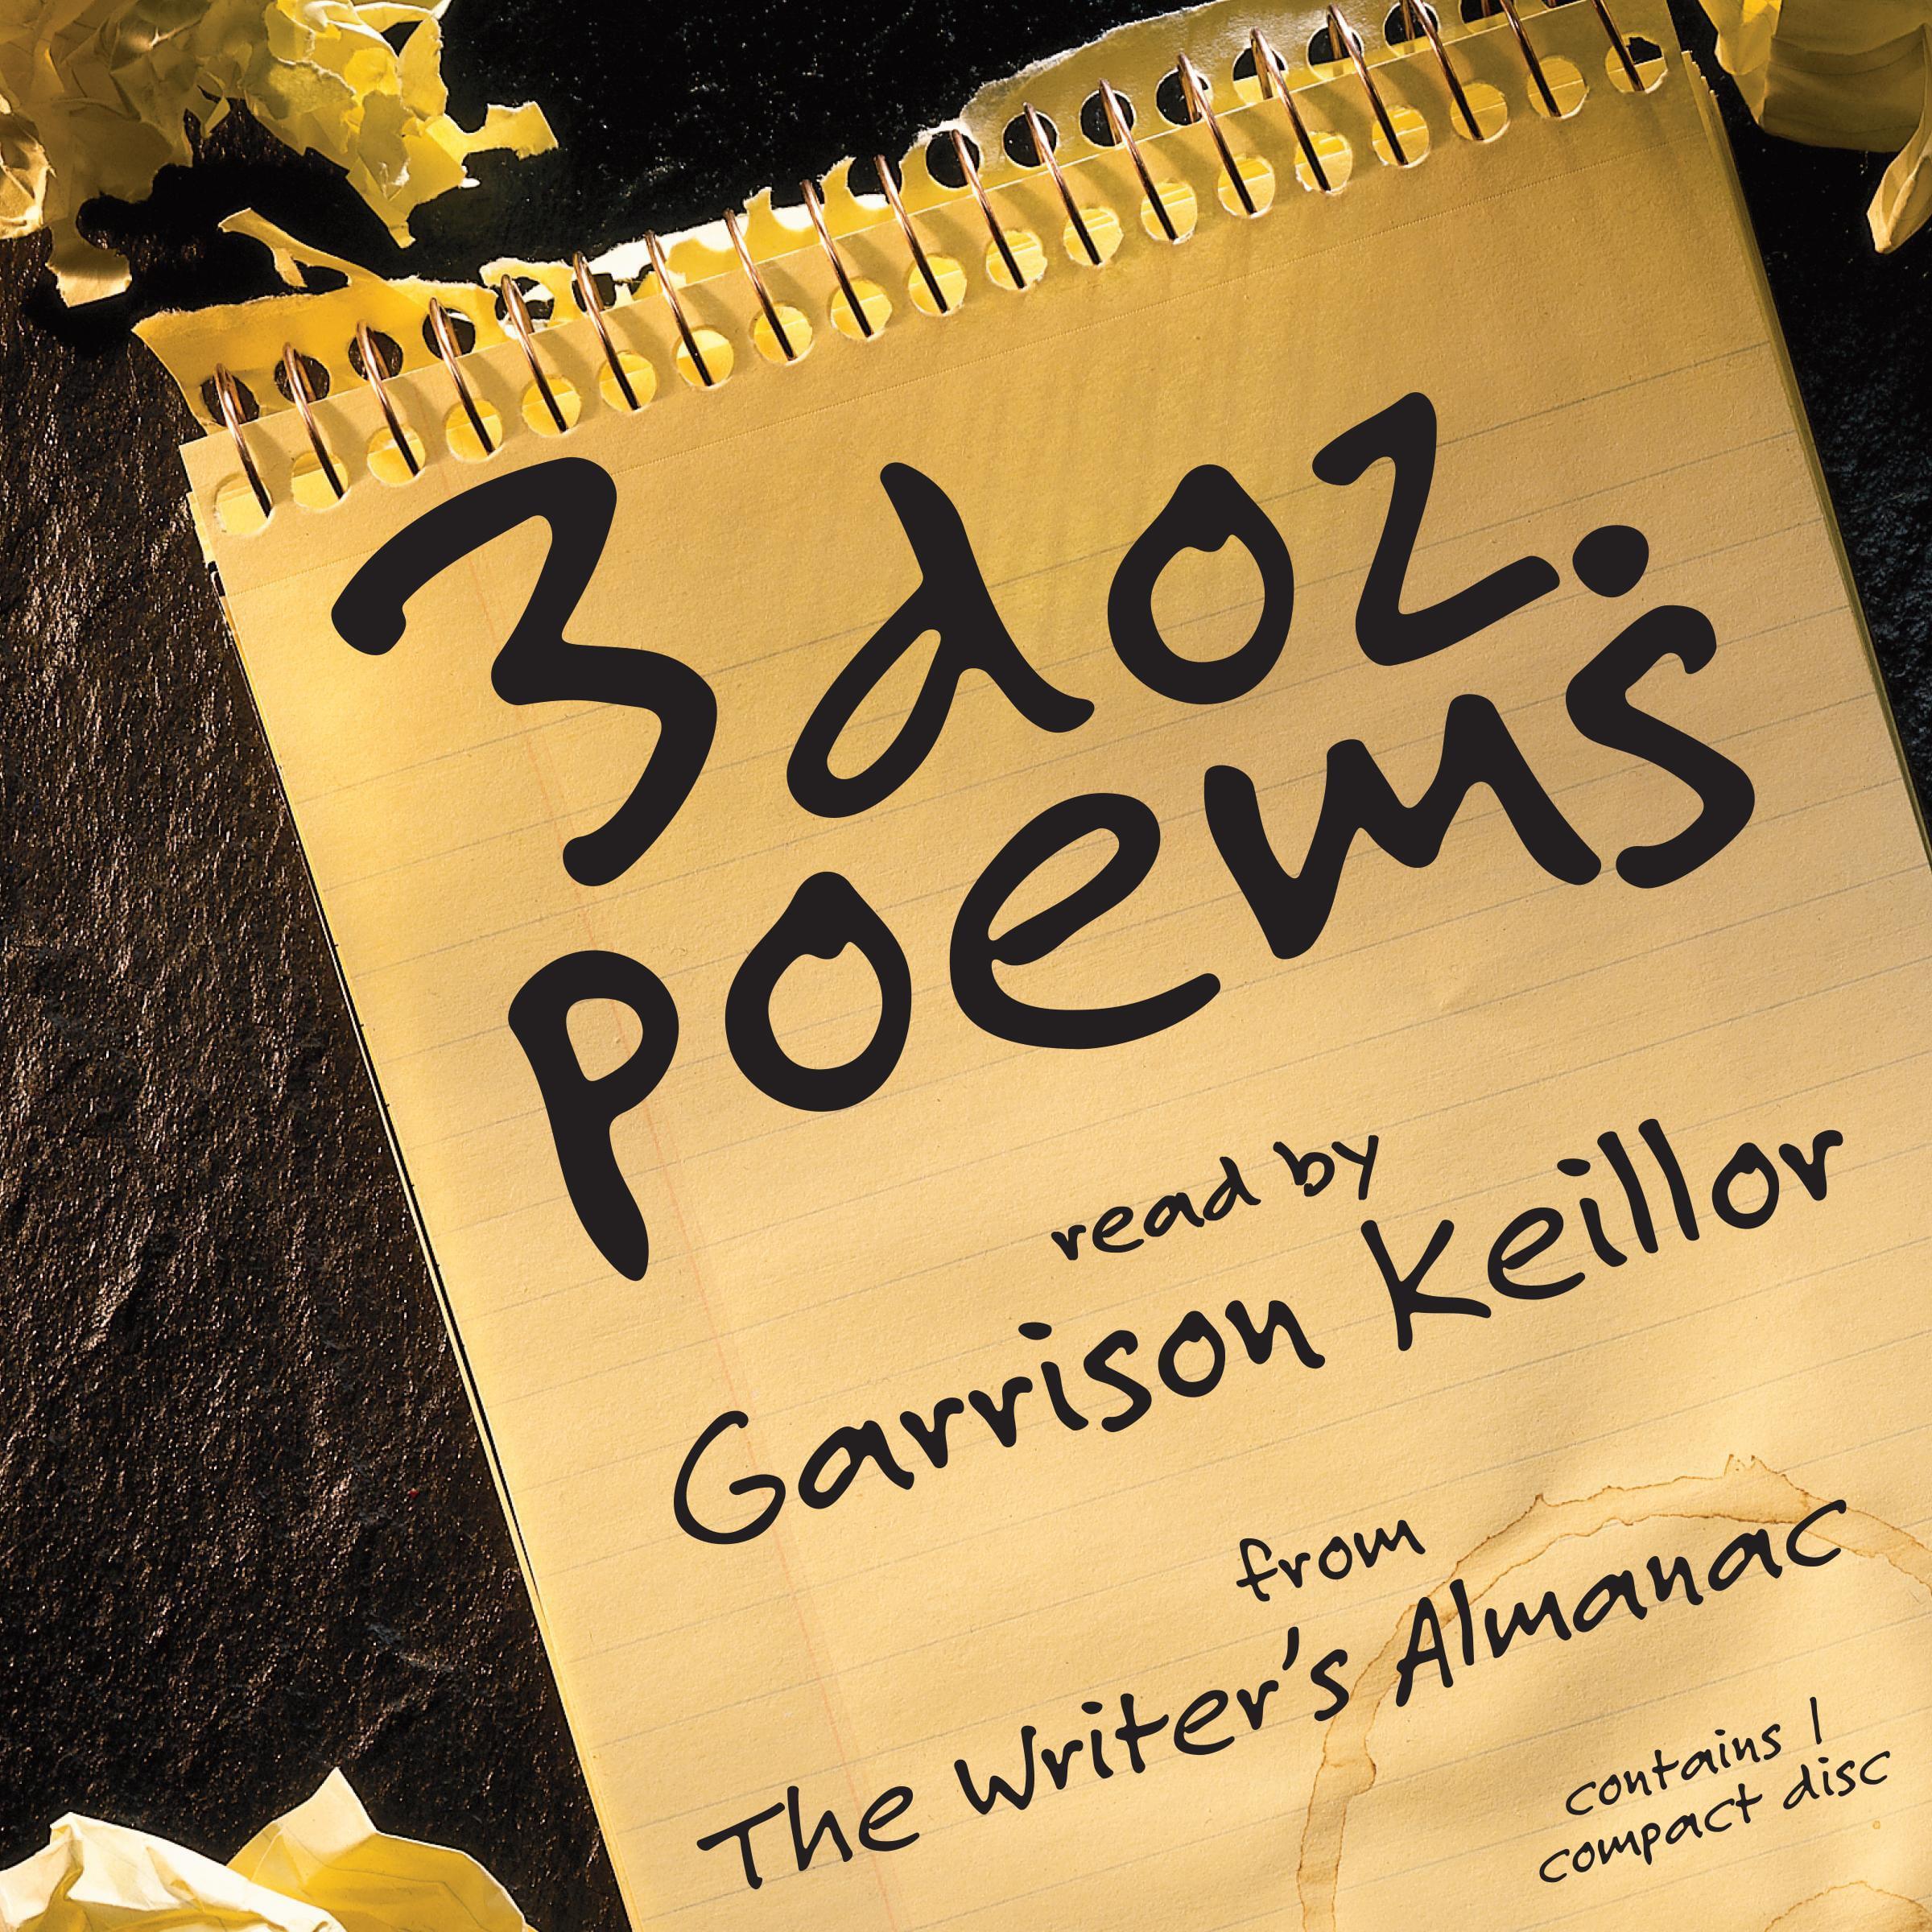 3 Dozen Poems : From the Writer's Almanac